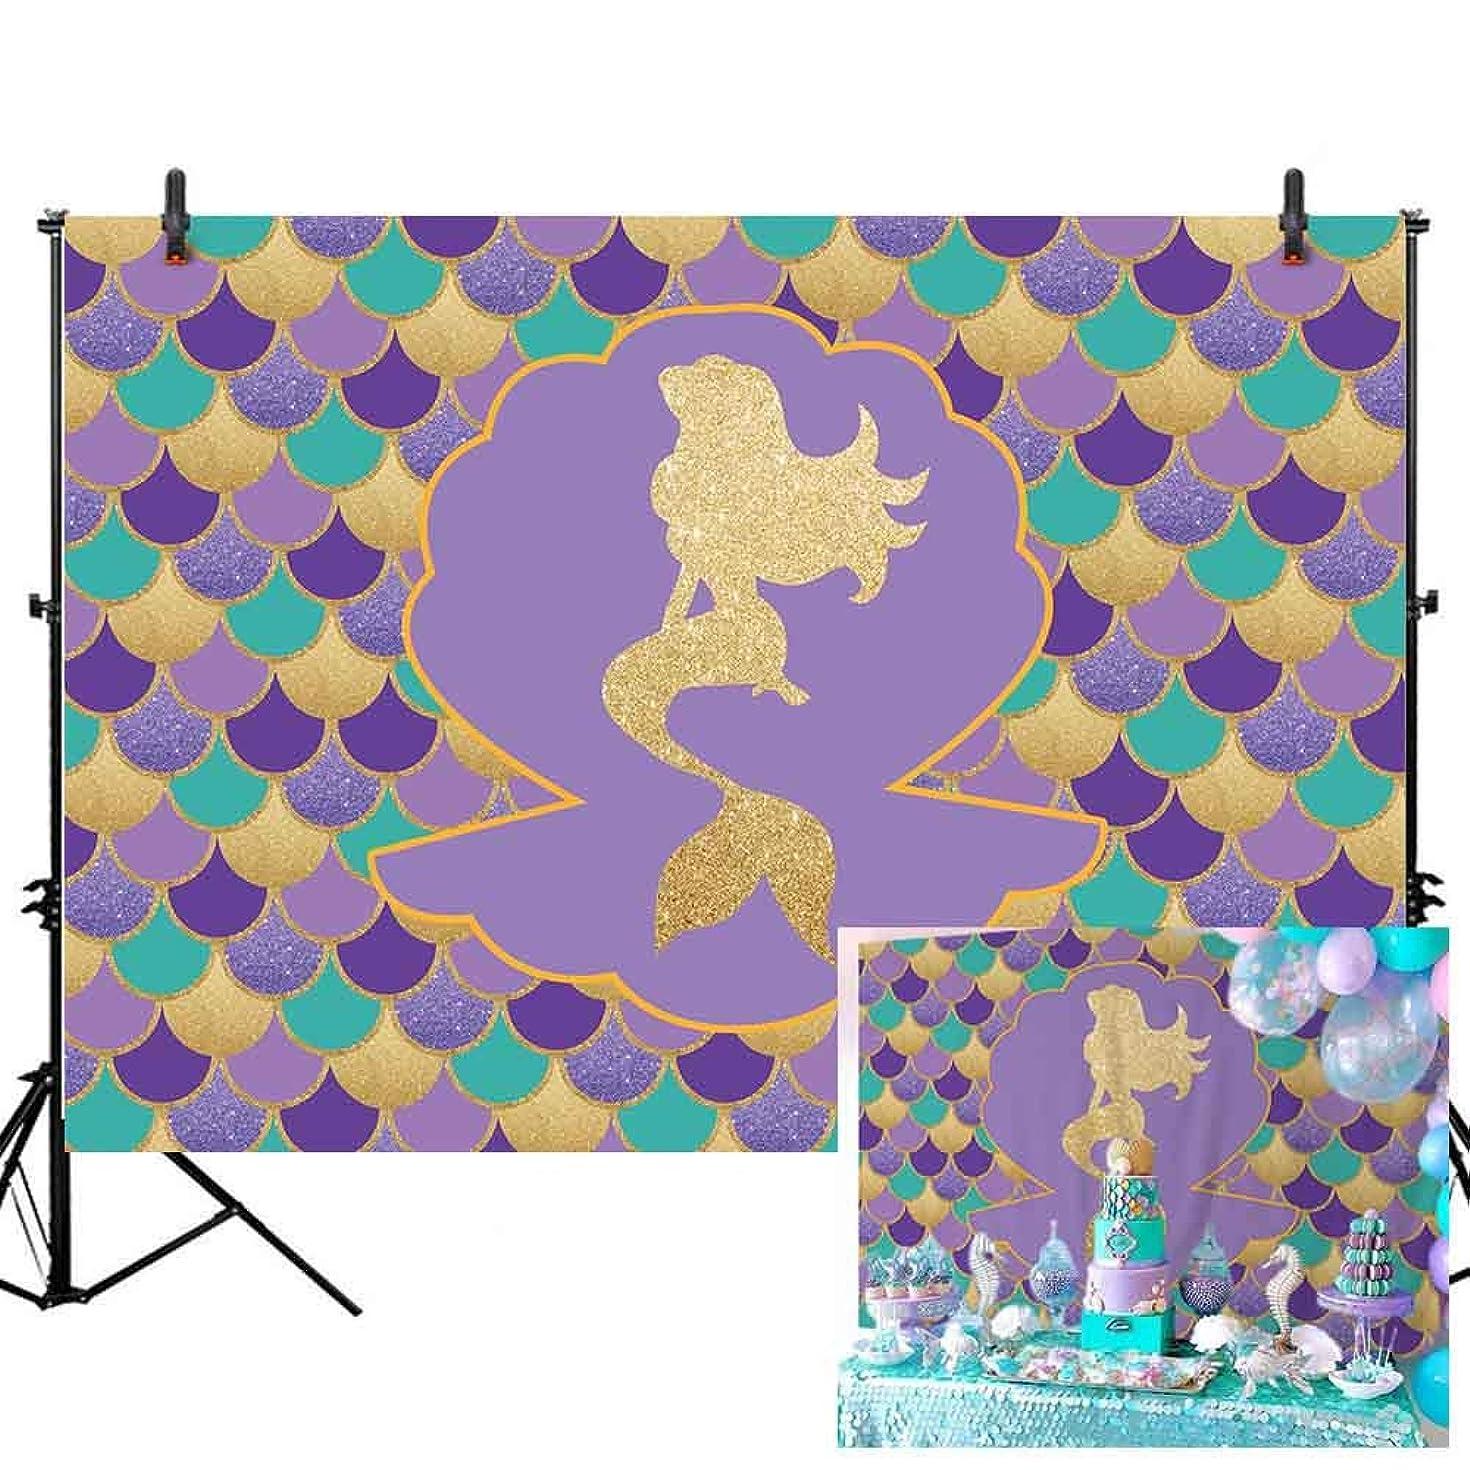 Allenjoy 7x5ft Under The Sea Little Mermaid Backdrop Glare Glitter Gold Purple Mermaid Scales Photography Background Kids Girls Princess Birthday Party Banner Newborn Baby Shower Decoration Props